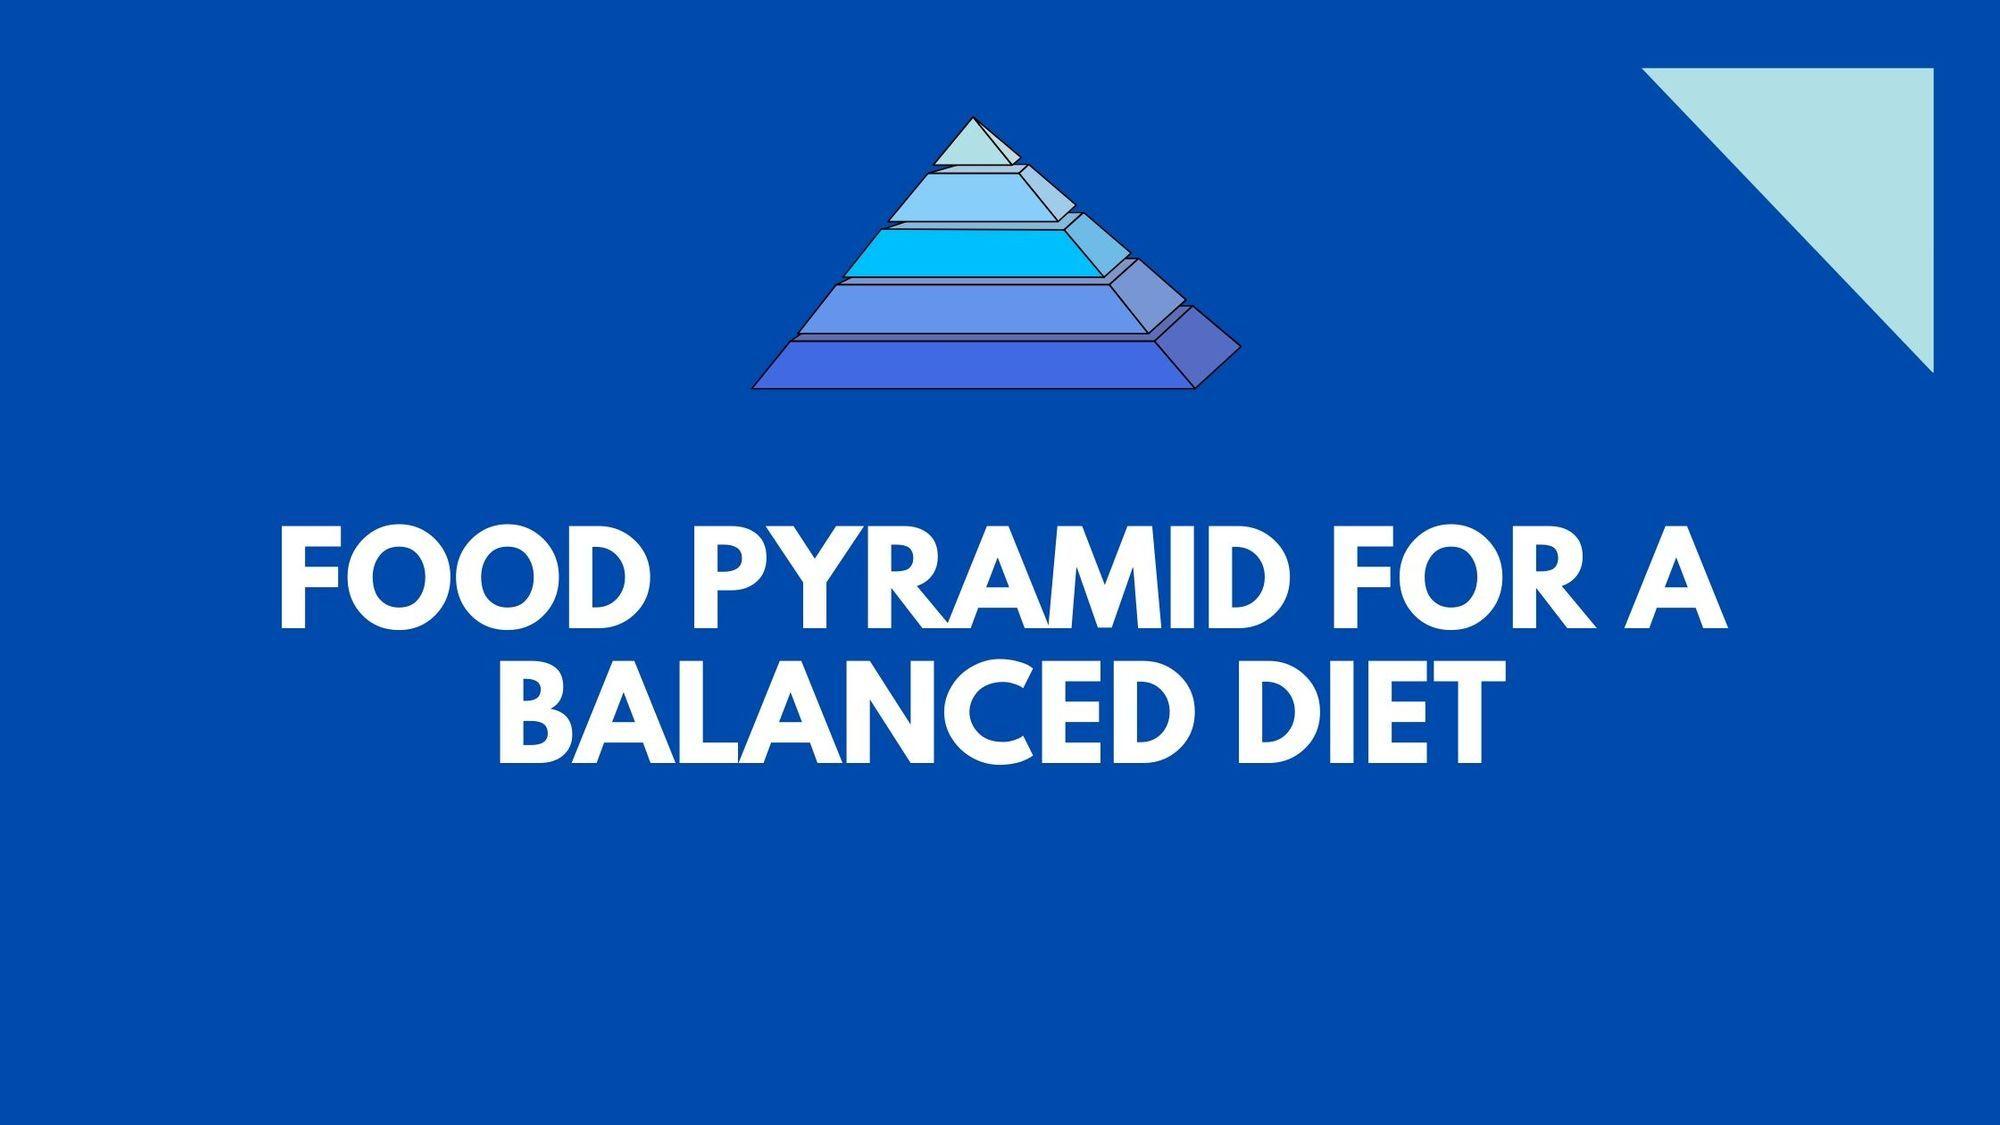 Food pyramid for a balanced diet food pyramid balanced